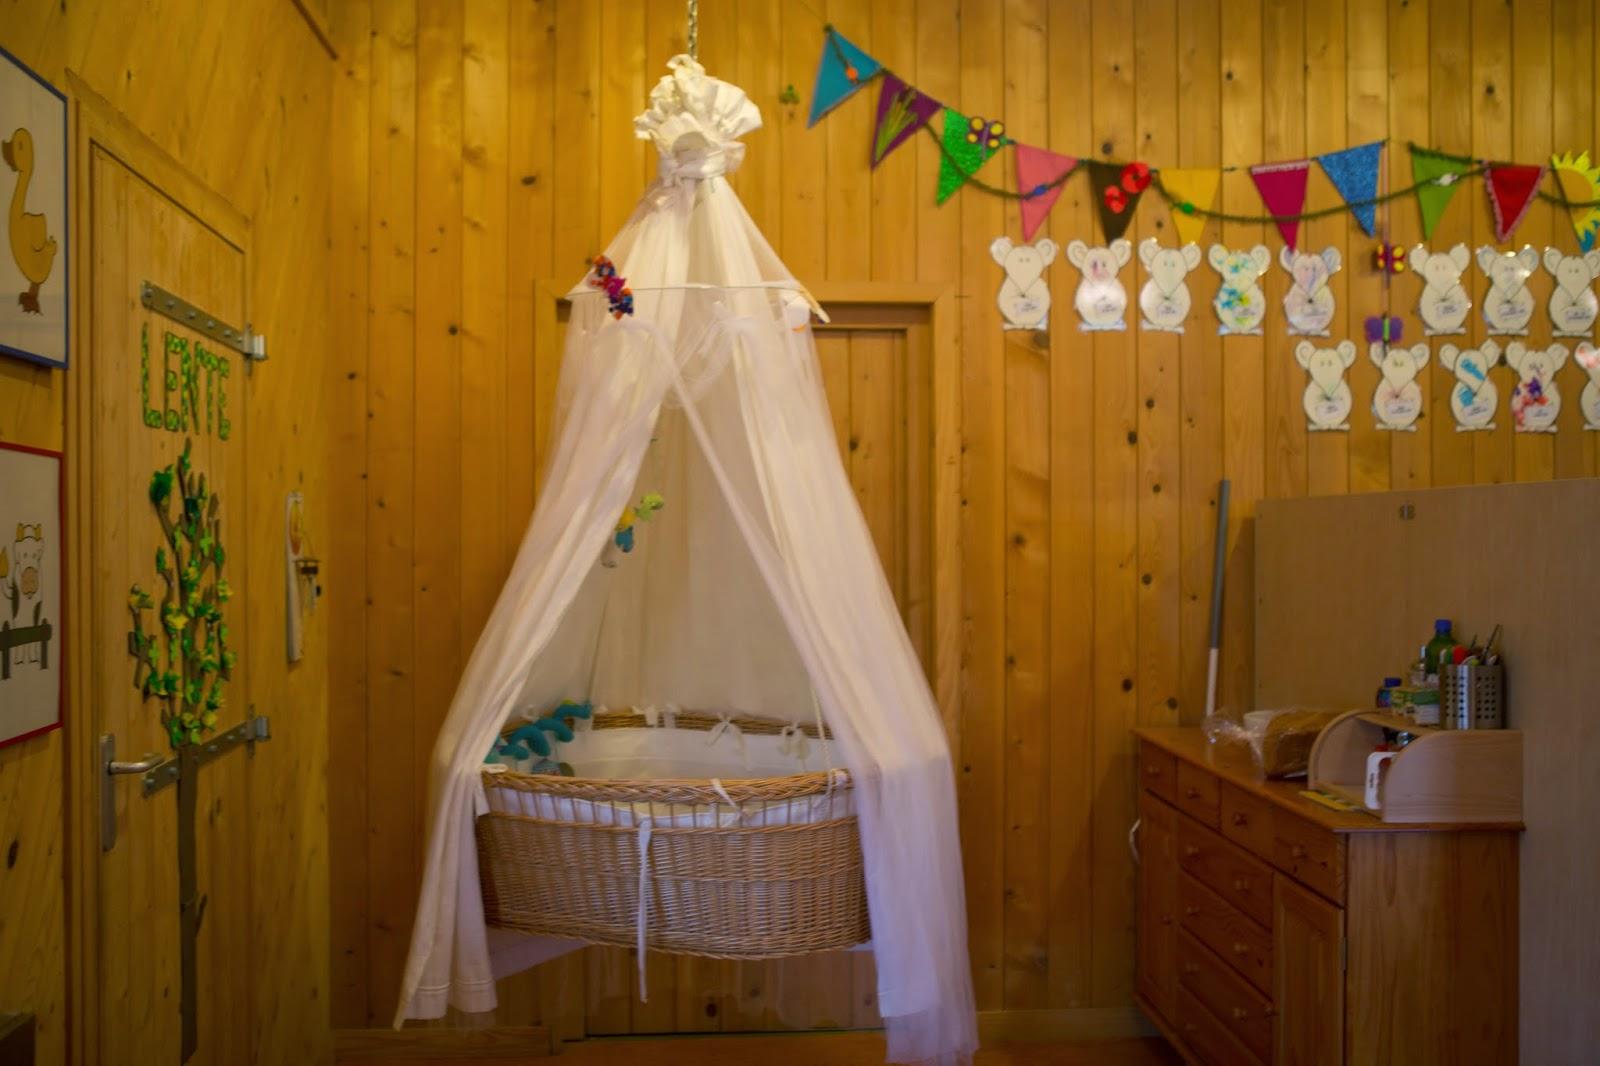 Kinderopvang het veldmuisje: foto's